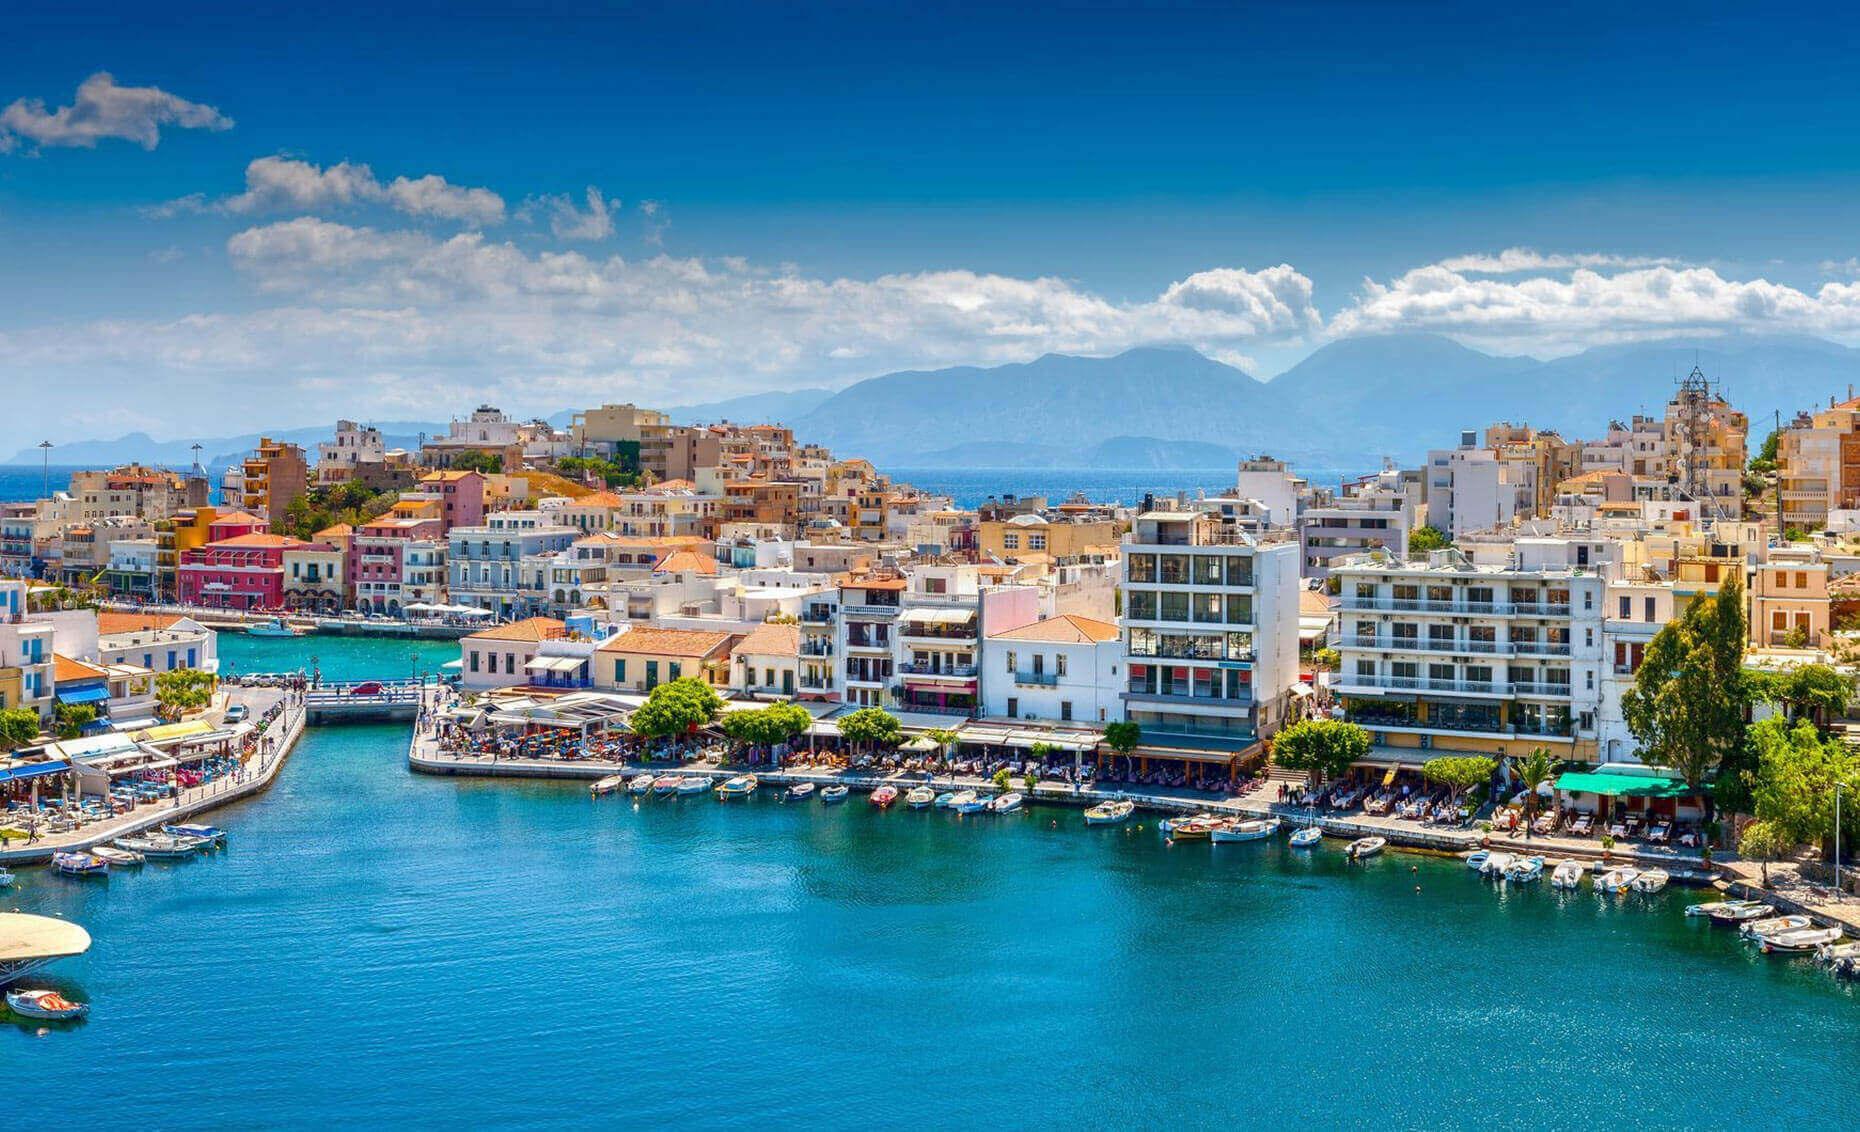 Villa, House, Home, Luxury, Family, Party, Beach, Pool, Holiday, Mykonos, France, Spain, Cannes, Cote D Azur, Marbella, Ibiza, Capri, St Tropez, Santorini, Italy, Greece, villas, holidays, rentals